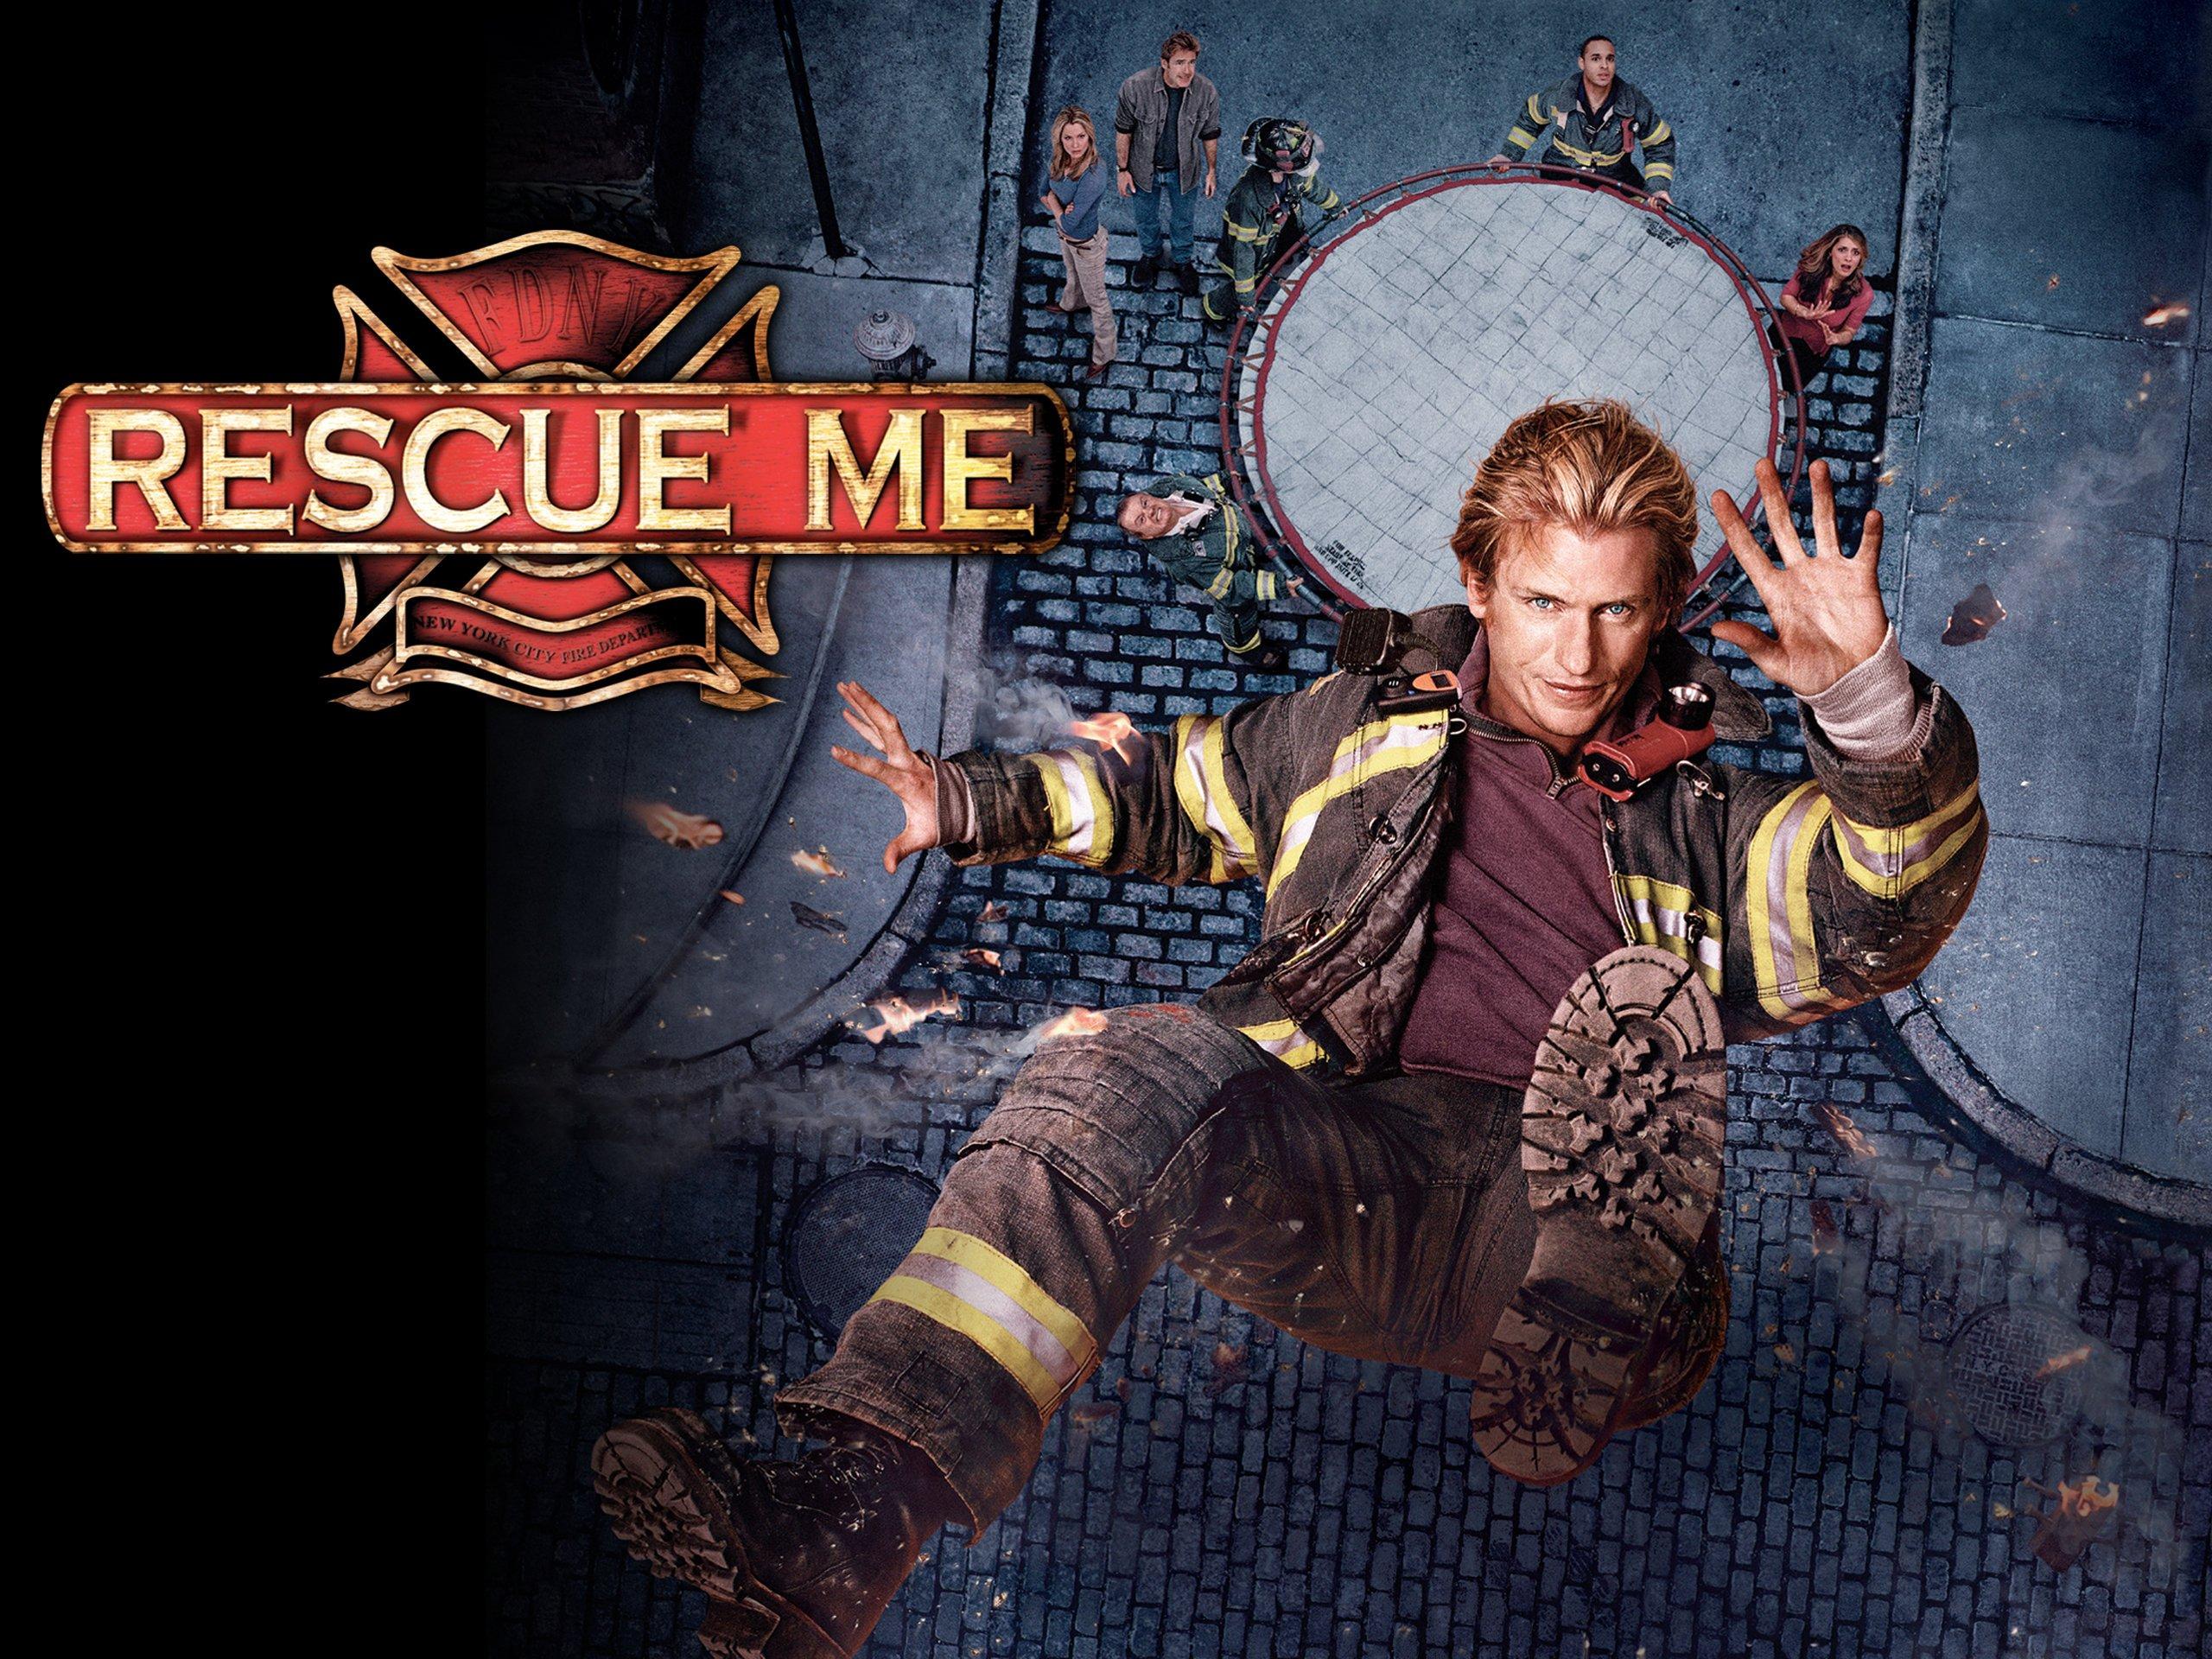 Rescue Me Episode 1 Anime